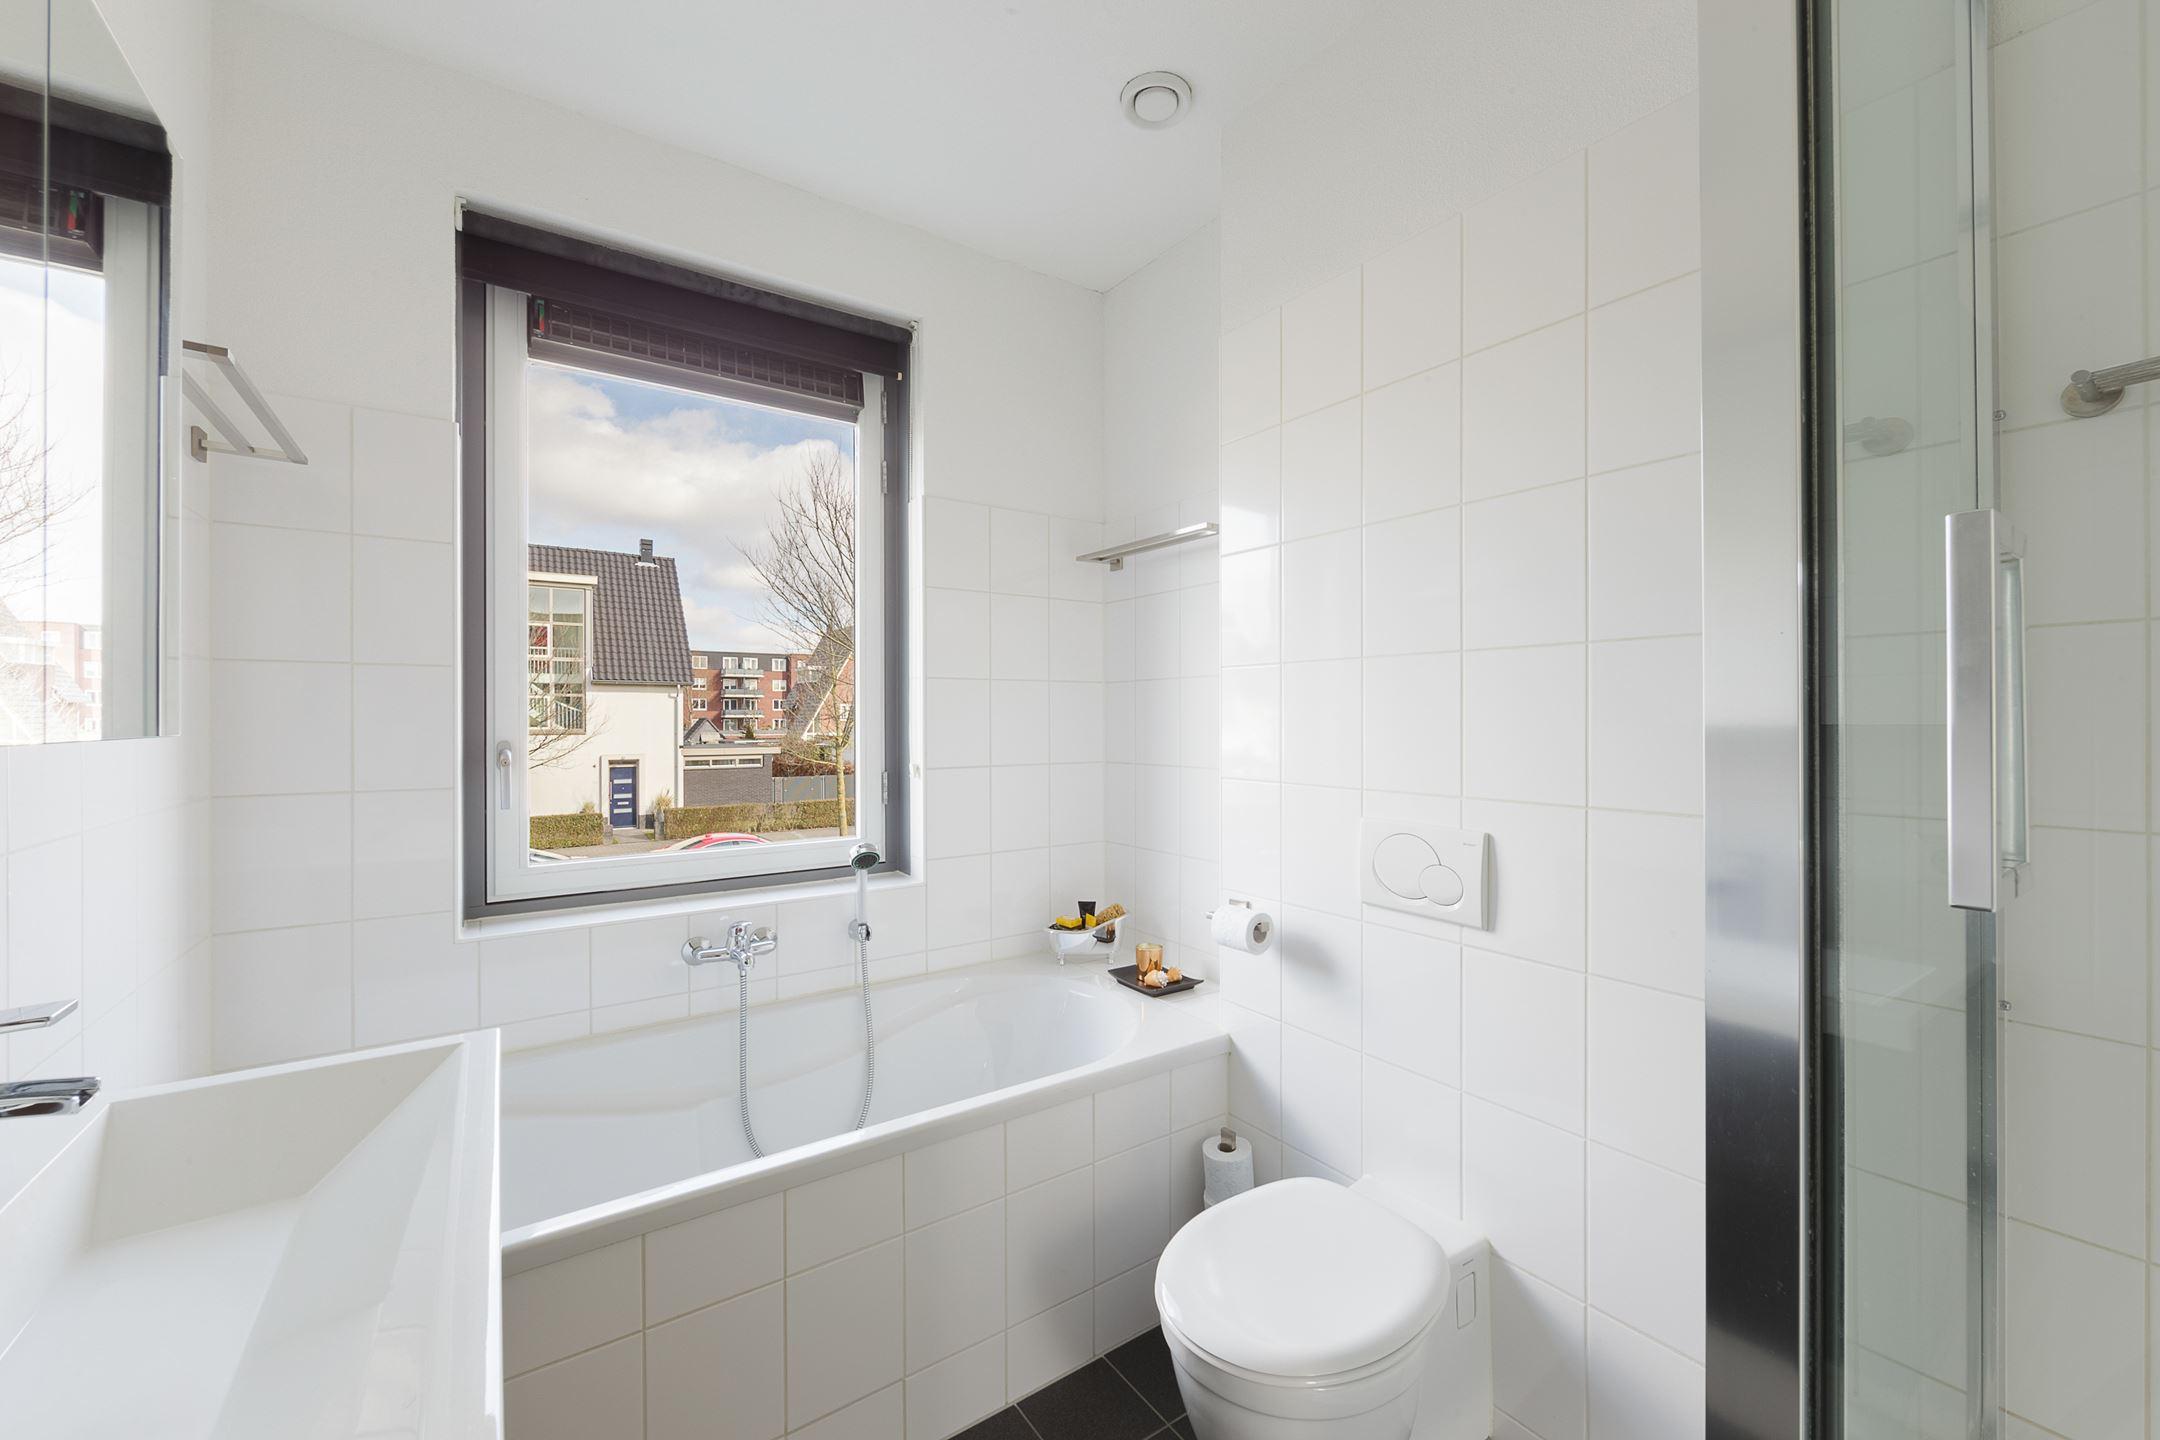 Badkamers Tilburg 587fsj. Latest Amazing Affordable Badkamer Vtwonen ...